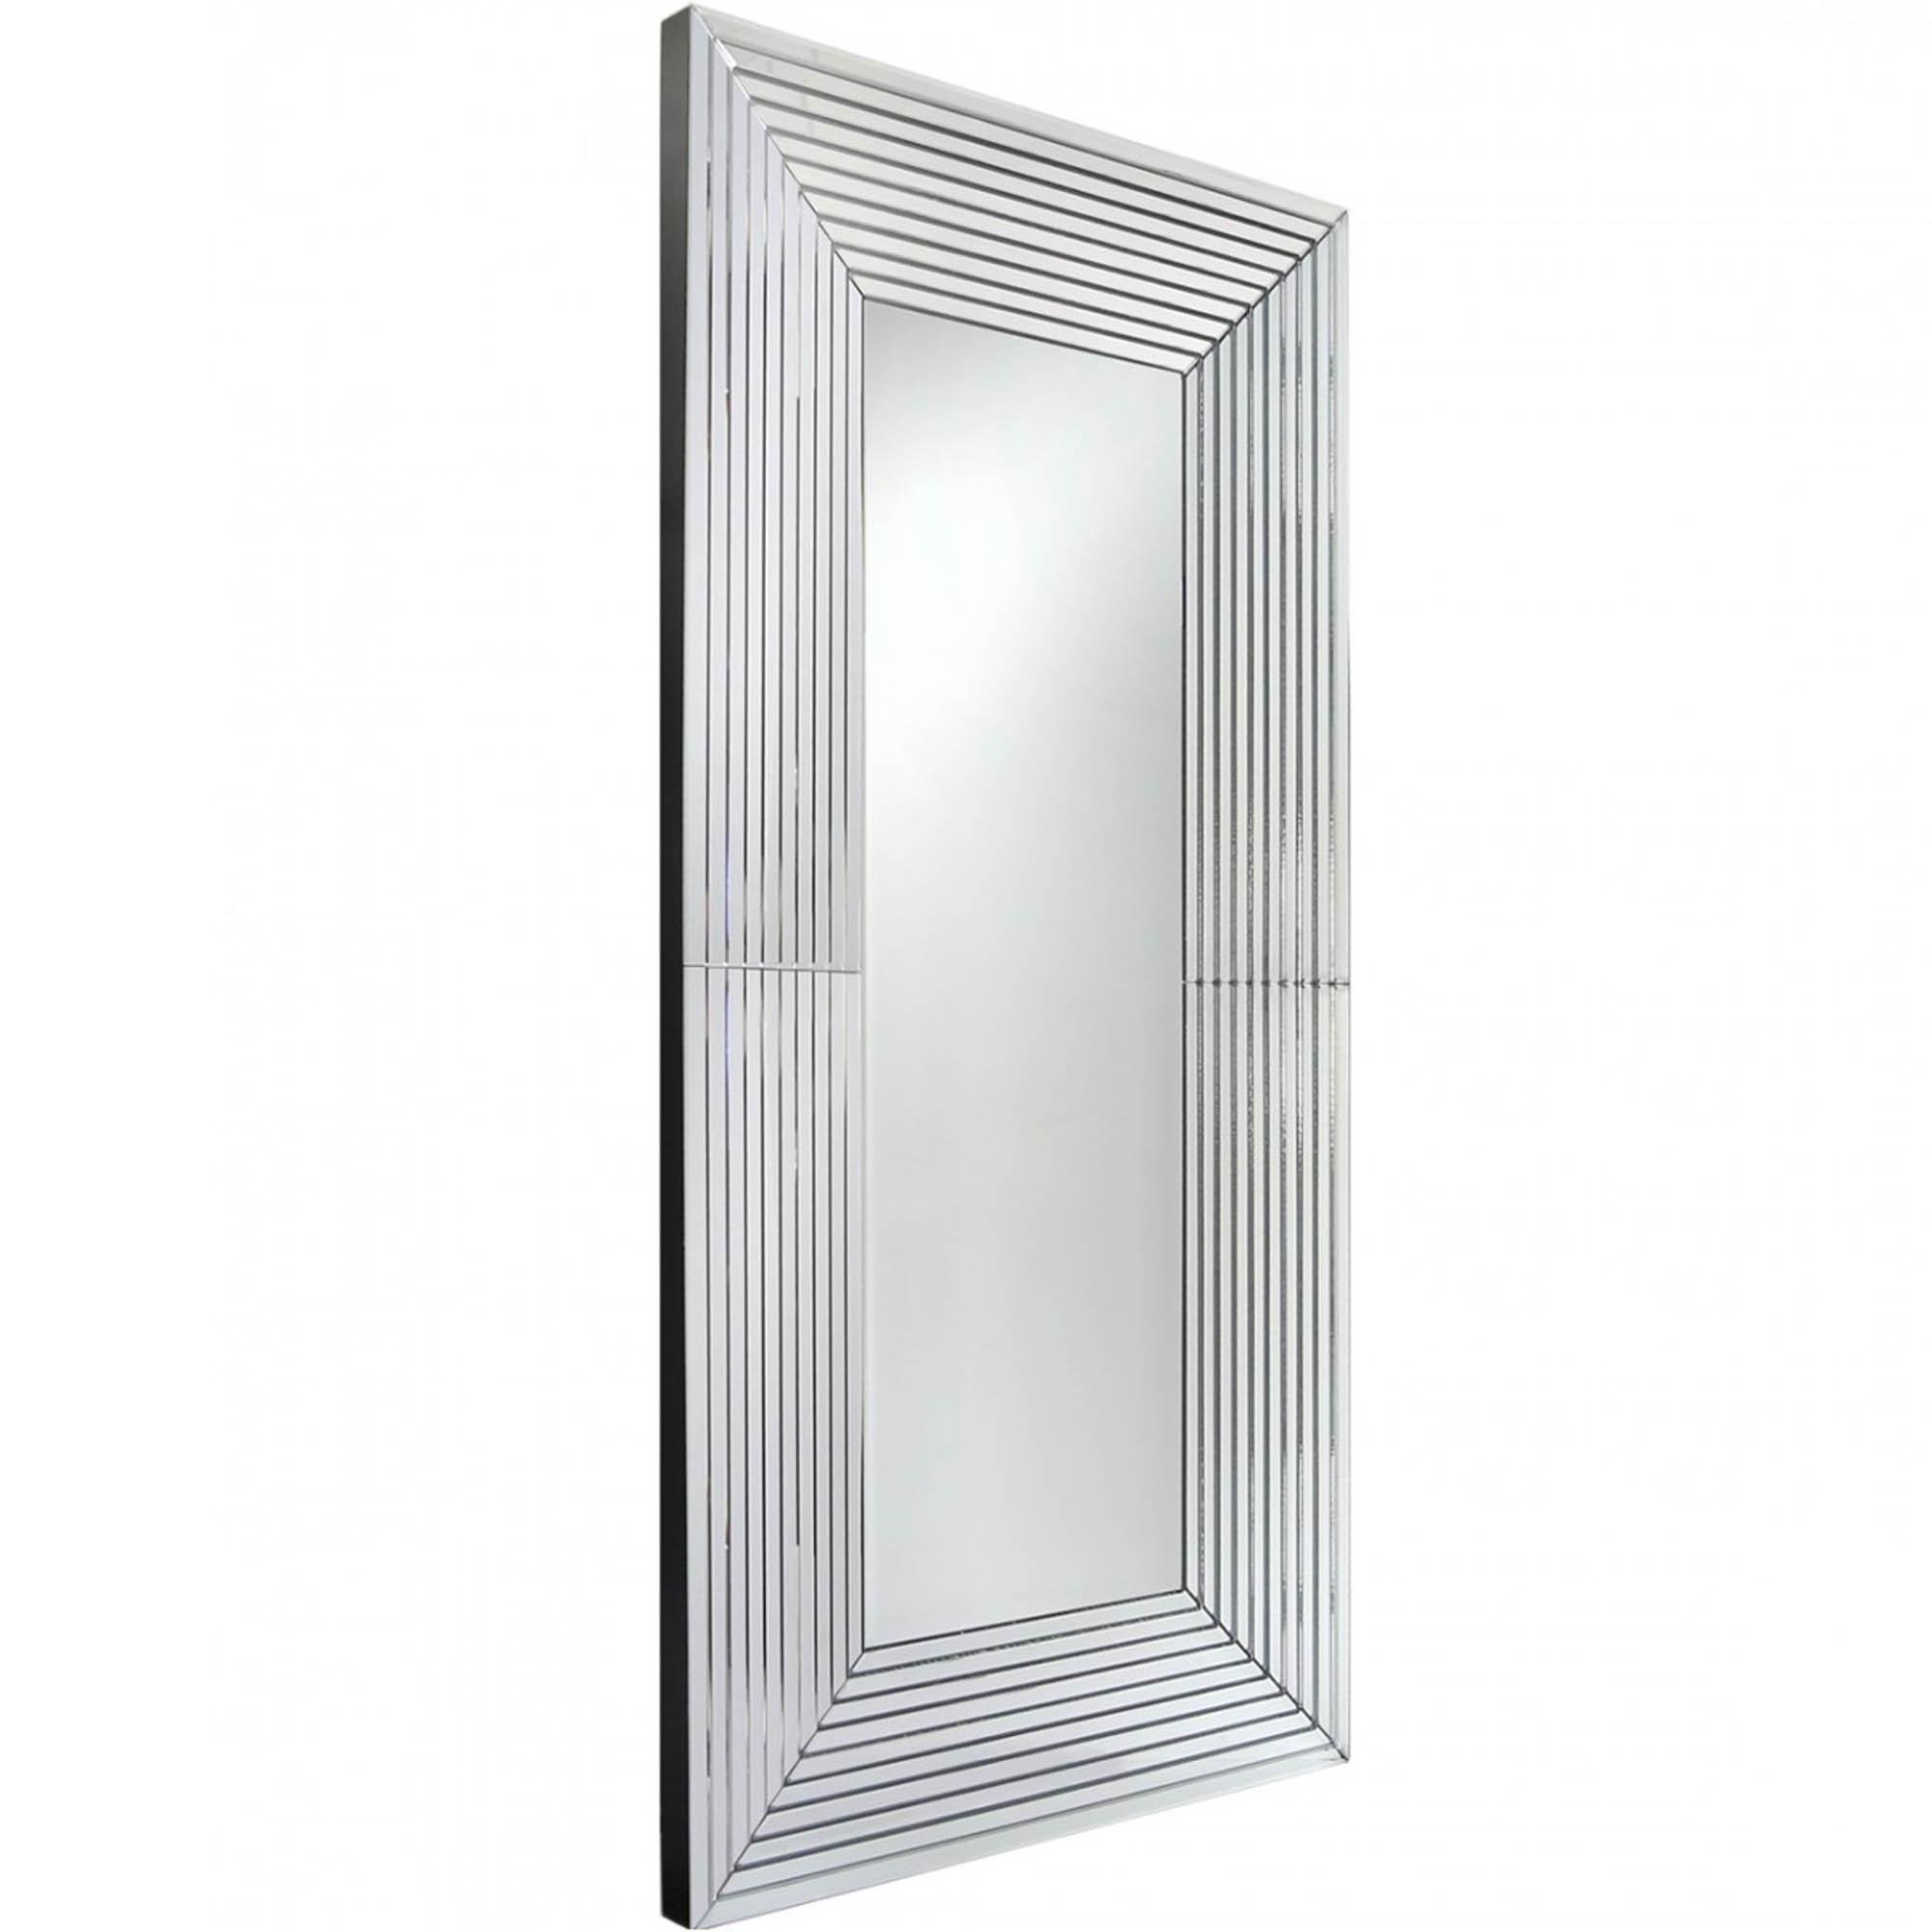 Slated Mirrored Frame Wall Mirror   Decor   HomesDirect365